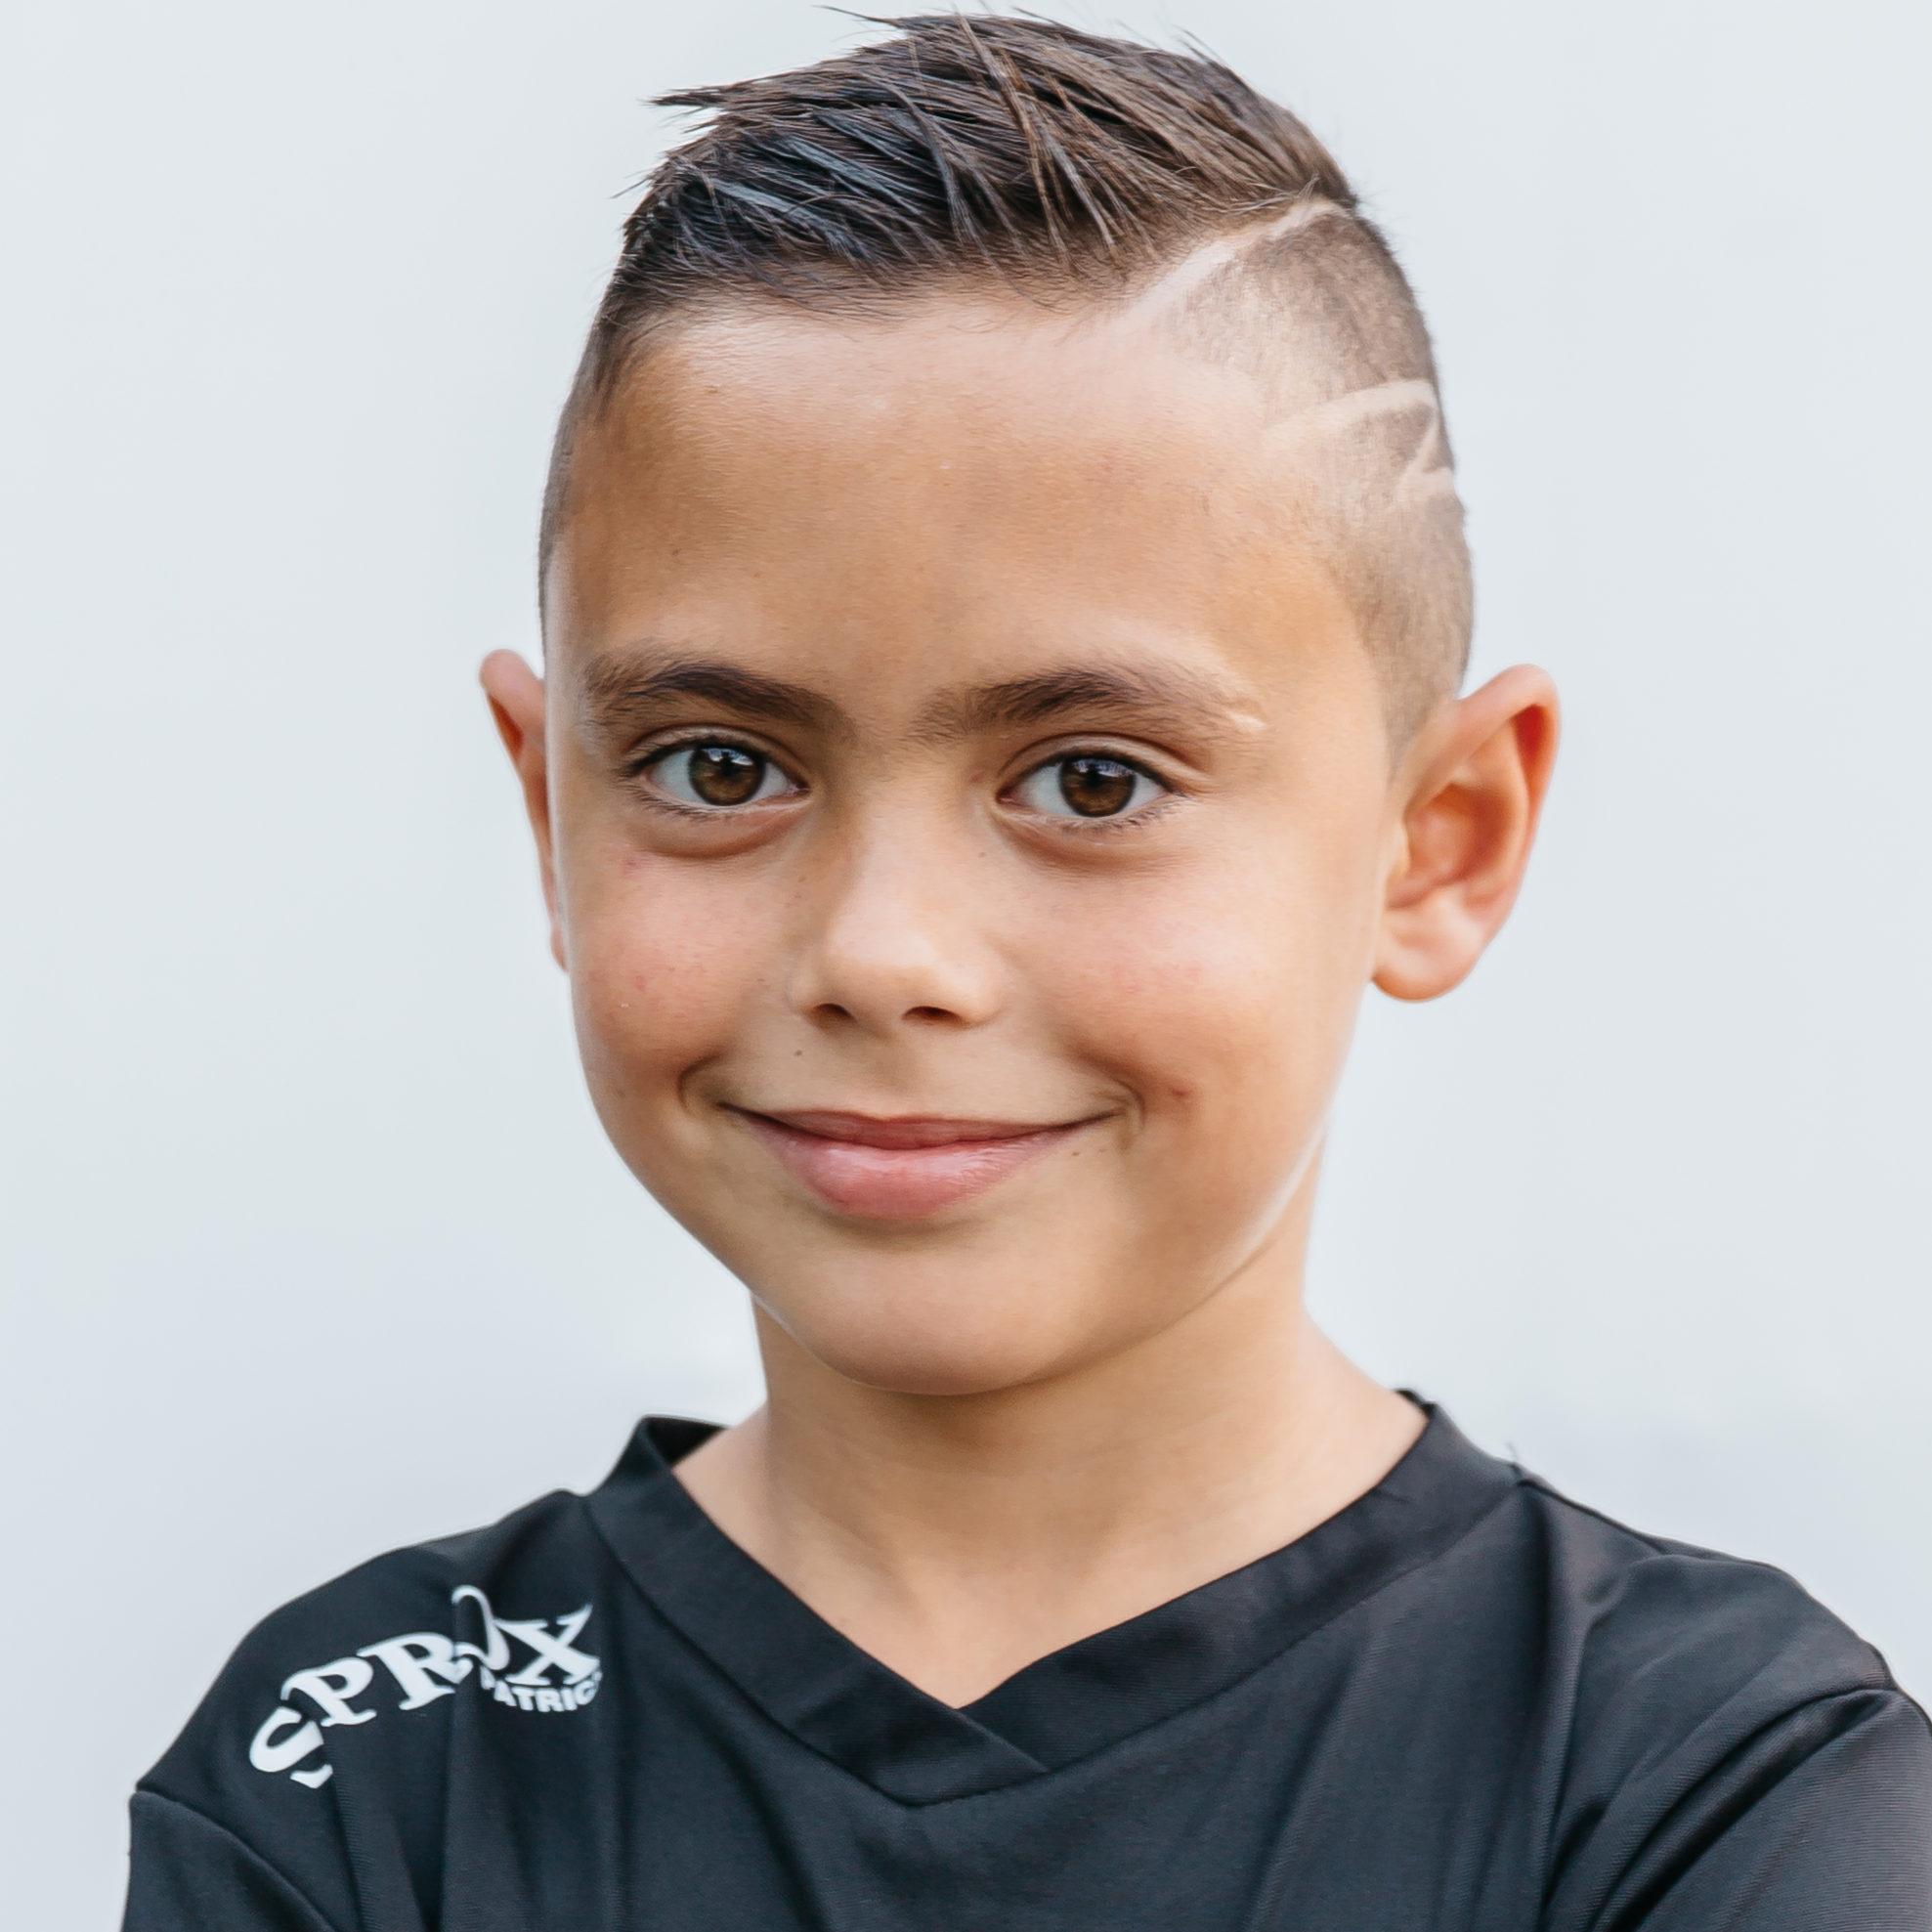 https://socceracademybreda.nl/wp-content/uploads/2019/05/SAB-Destan-1-1-e1568215920846.jpg